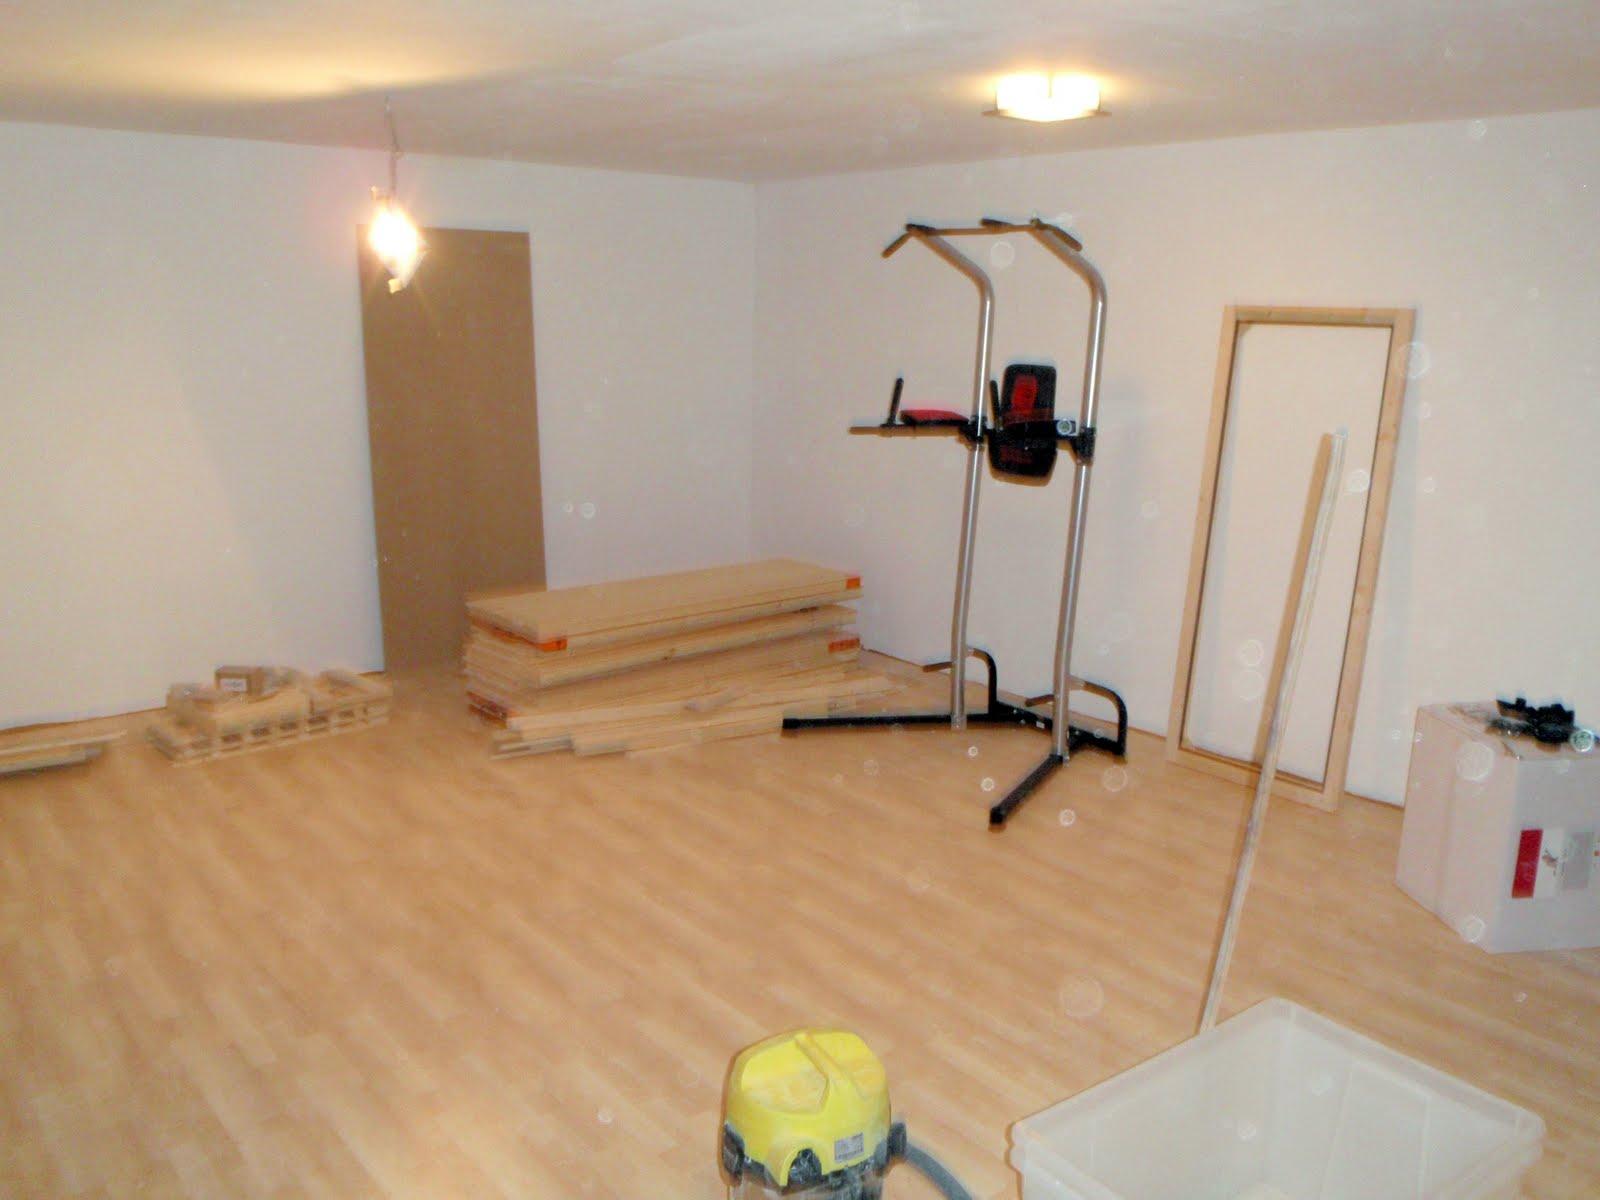 zieglers bauen haus hausbau woche 56 samstag. Black Bedroom Furniture Sets. Home Design Ideas